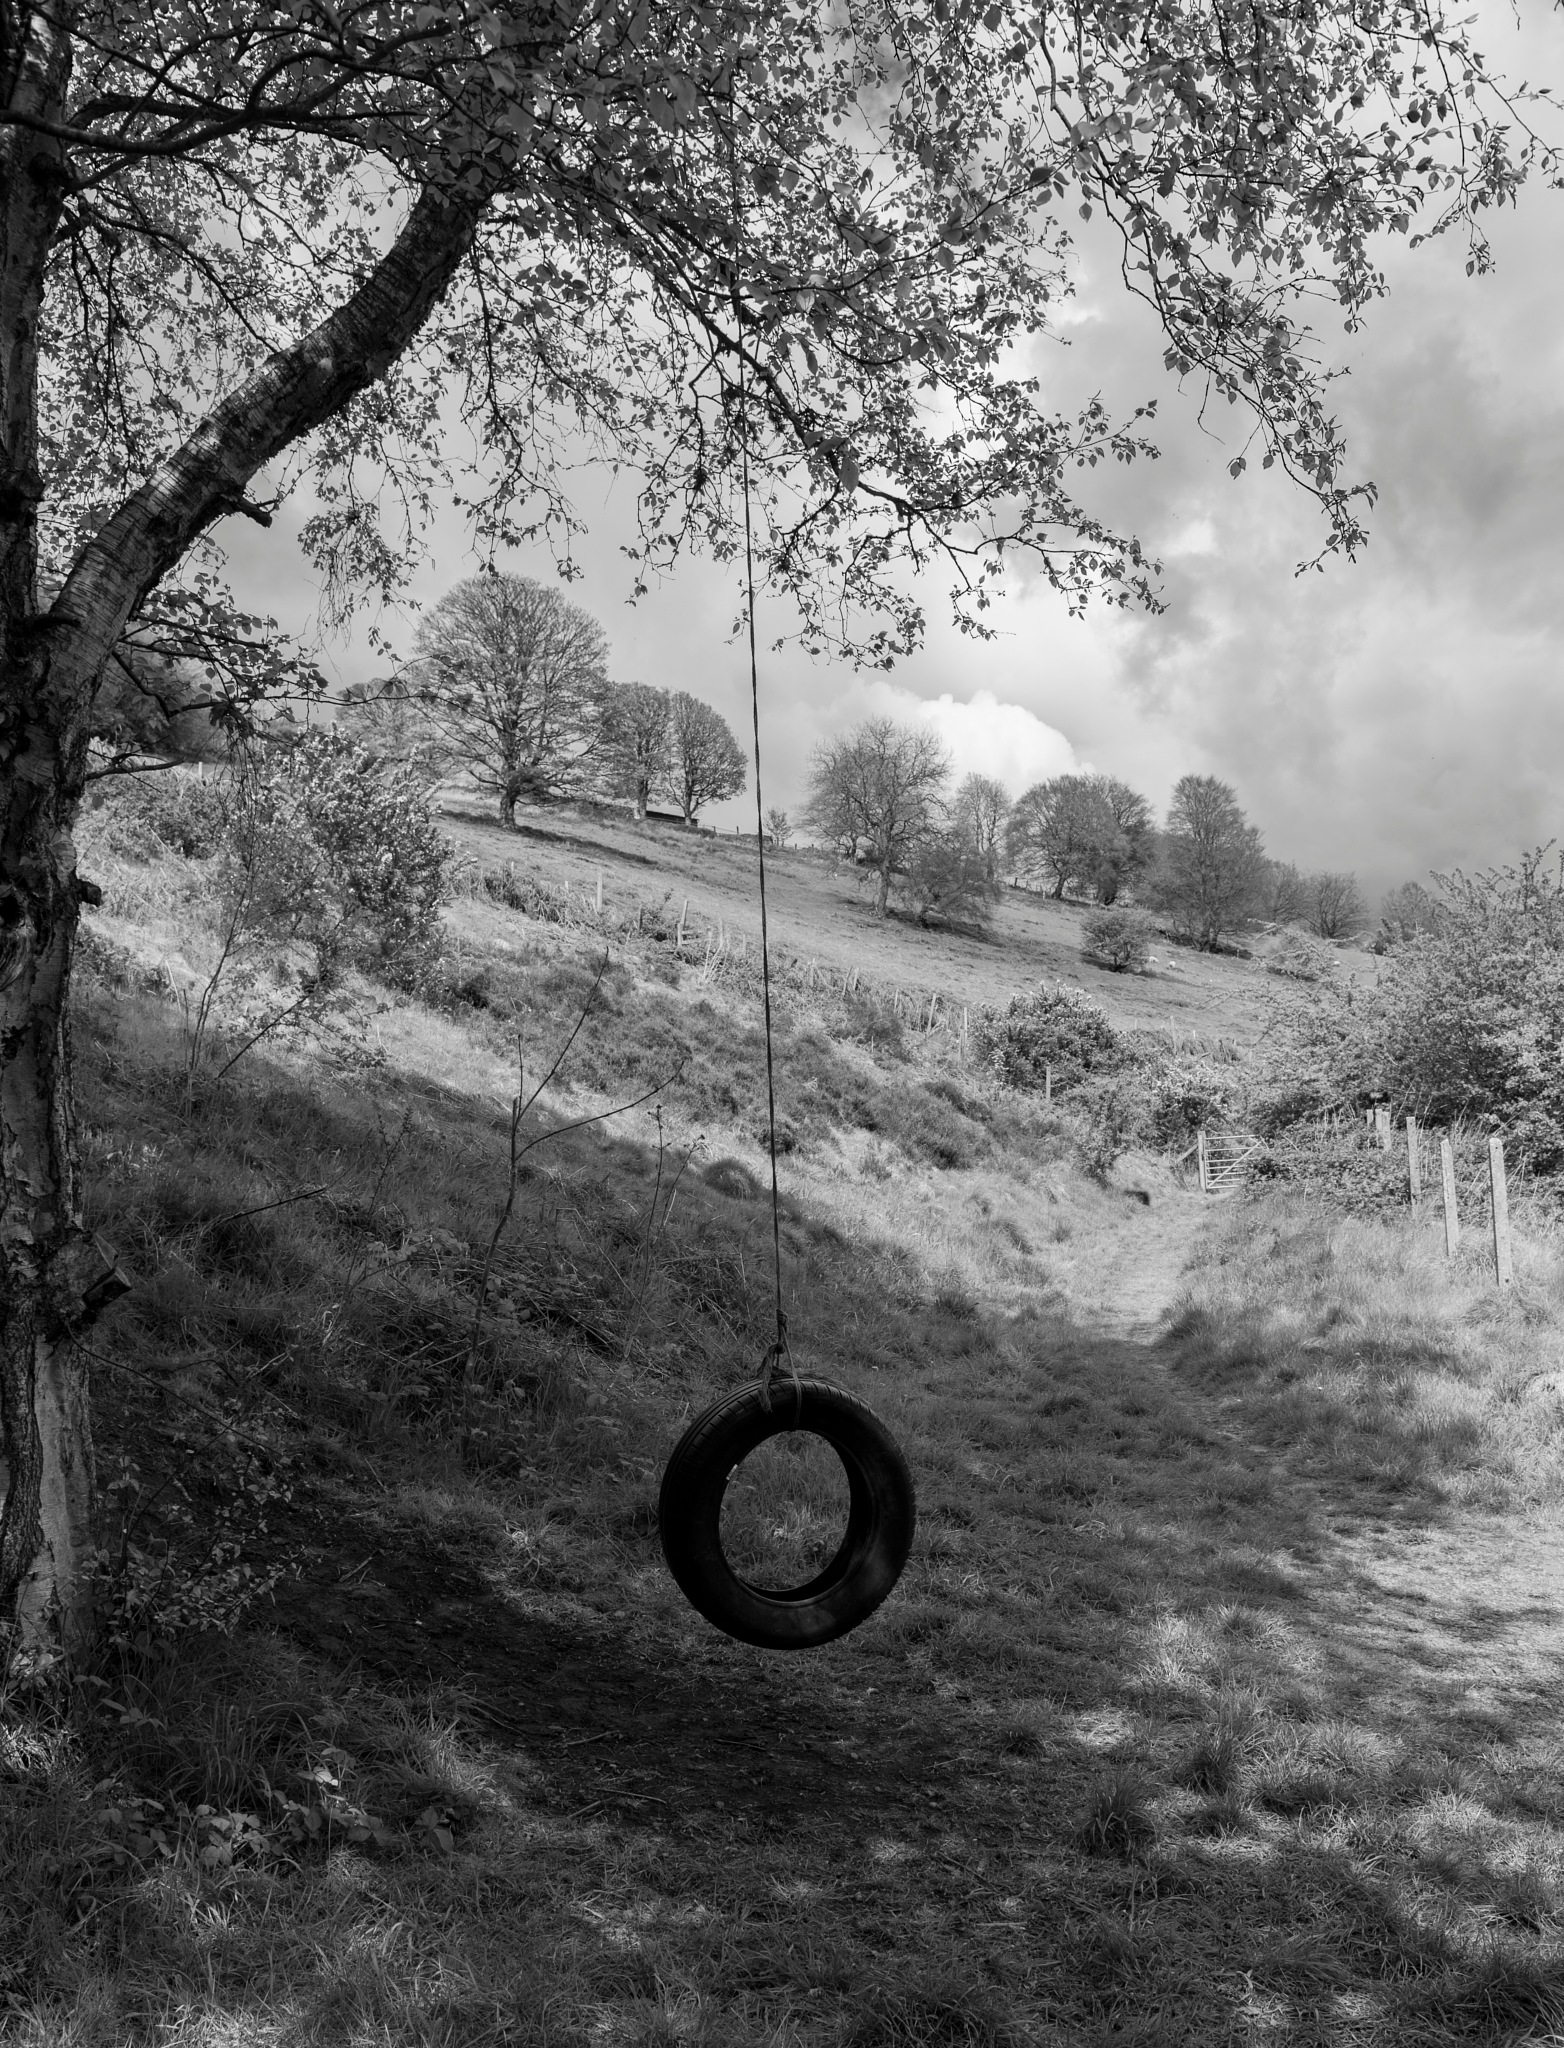 Tyre swing by lindans